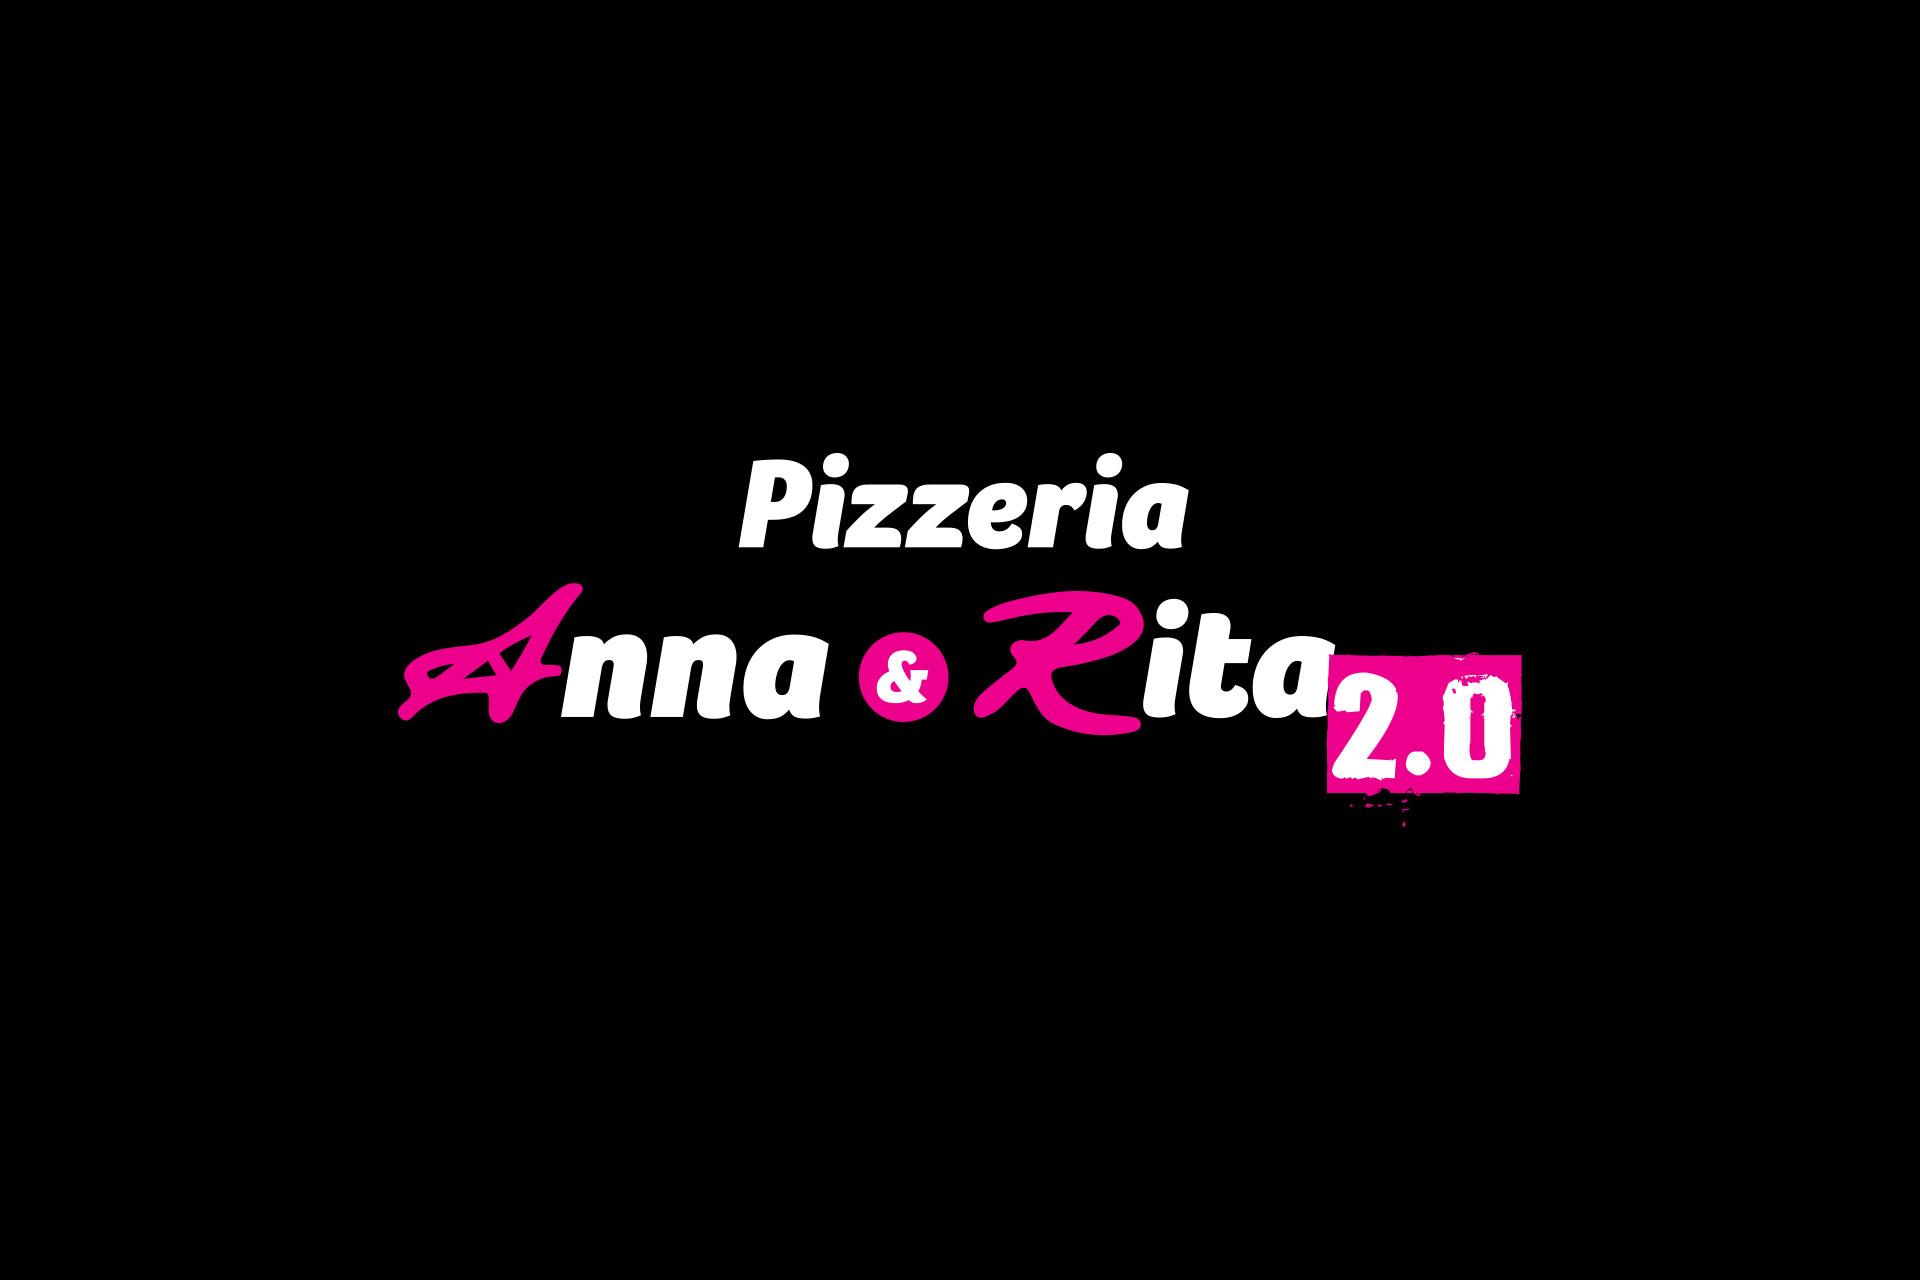 Pizzeria Anna & Rita 2.0